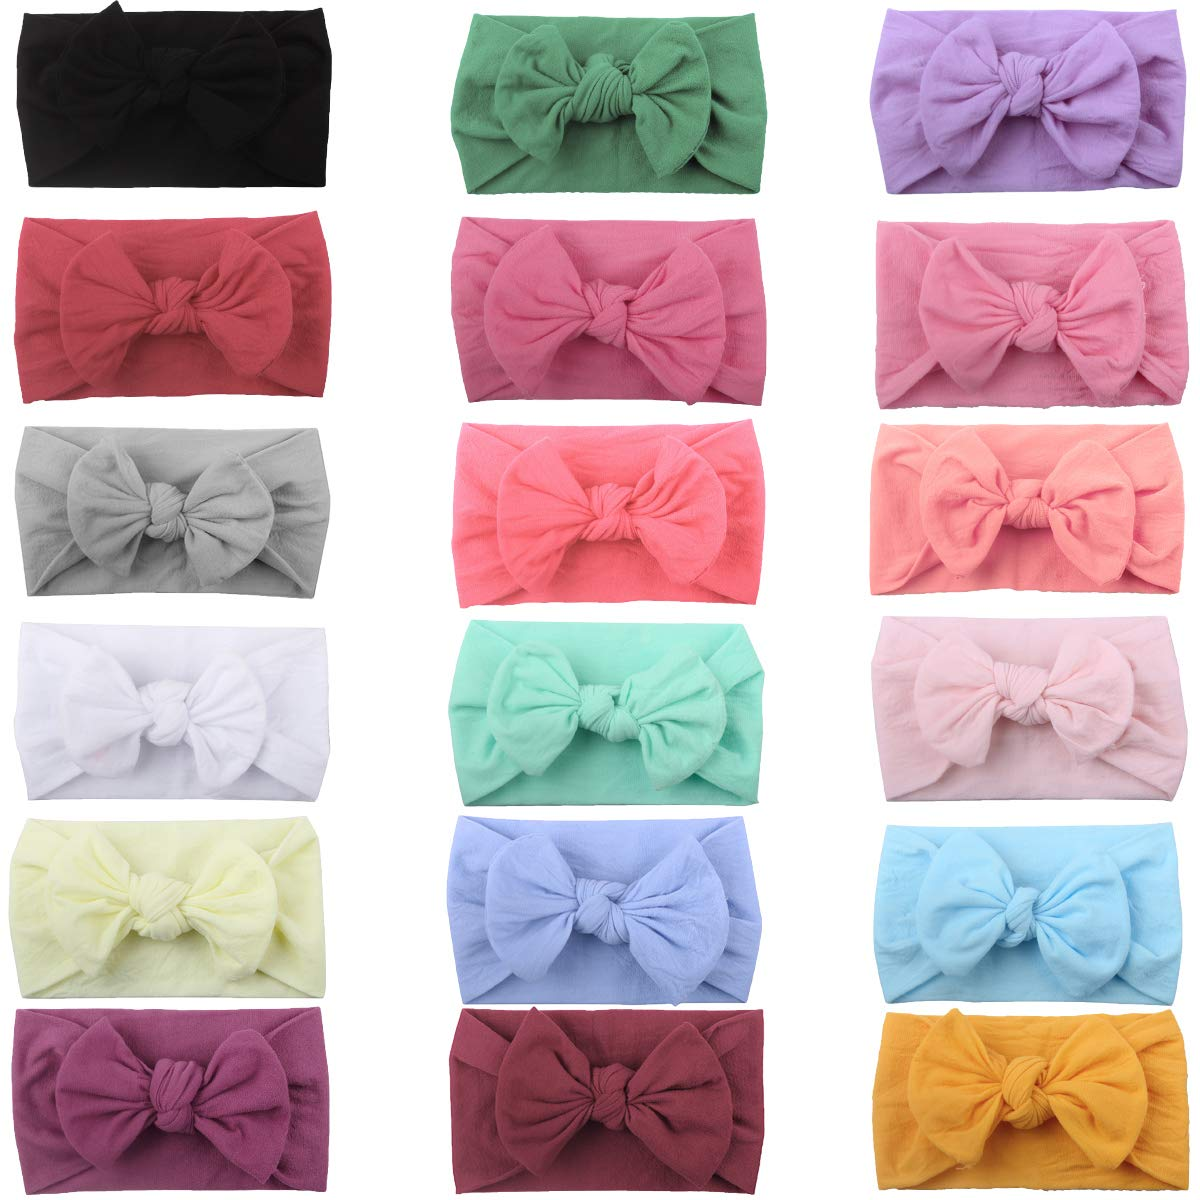 DeD 18 Pieces Nylon Newborn Headbands Hair Bows Elastics Soft Bands for Newborns Infants Toddlers